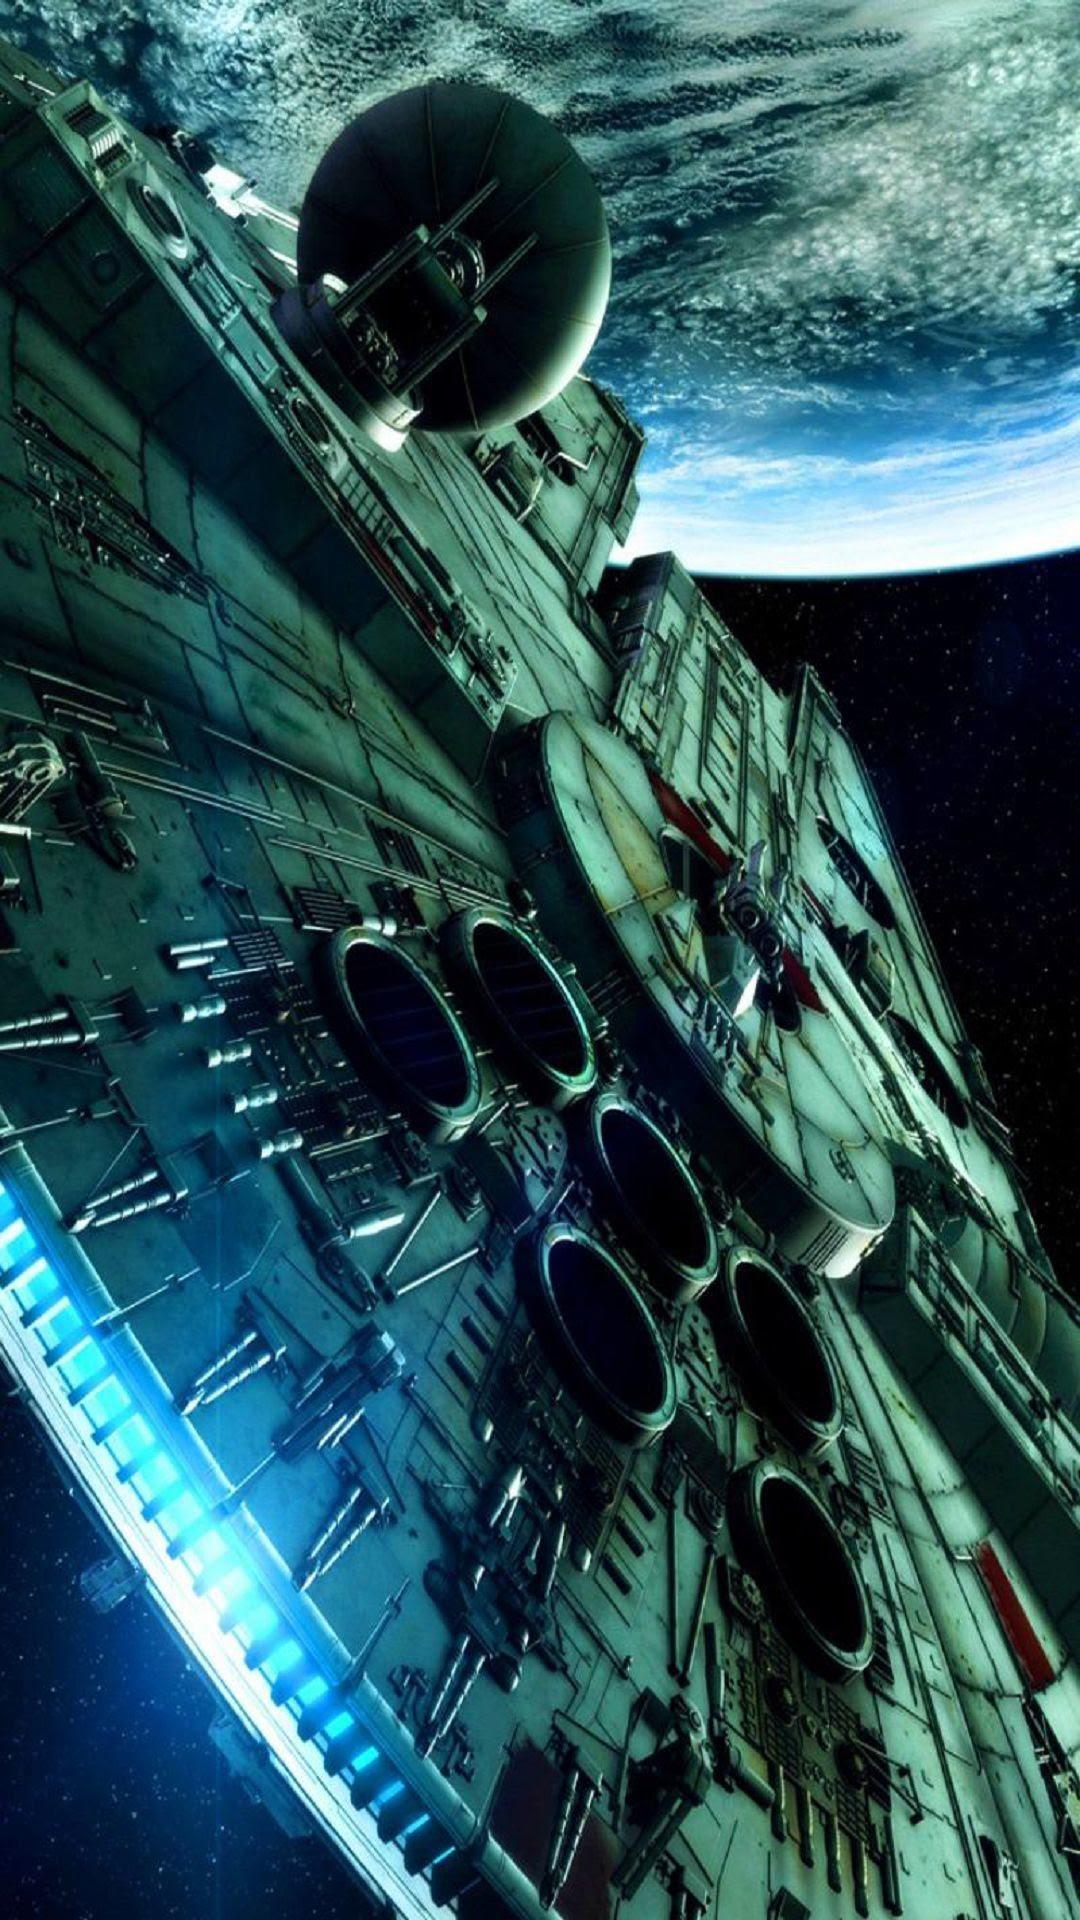 Star Wars Wallpaper Iphone 11 Get Images